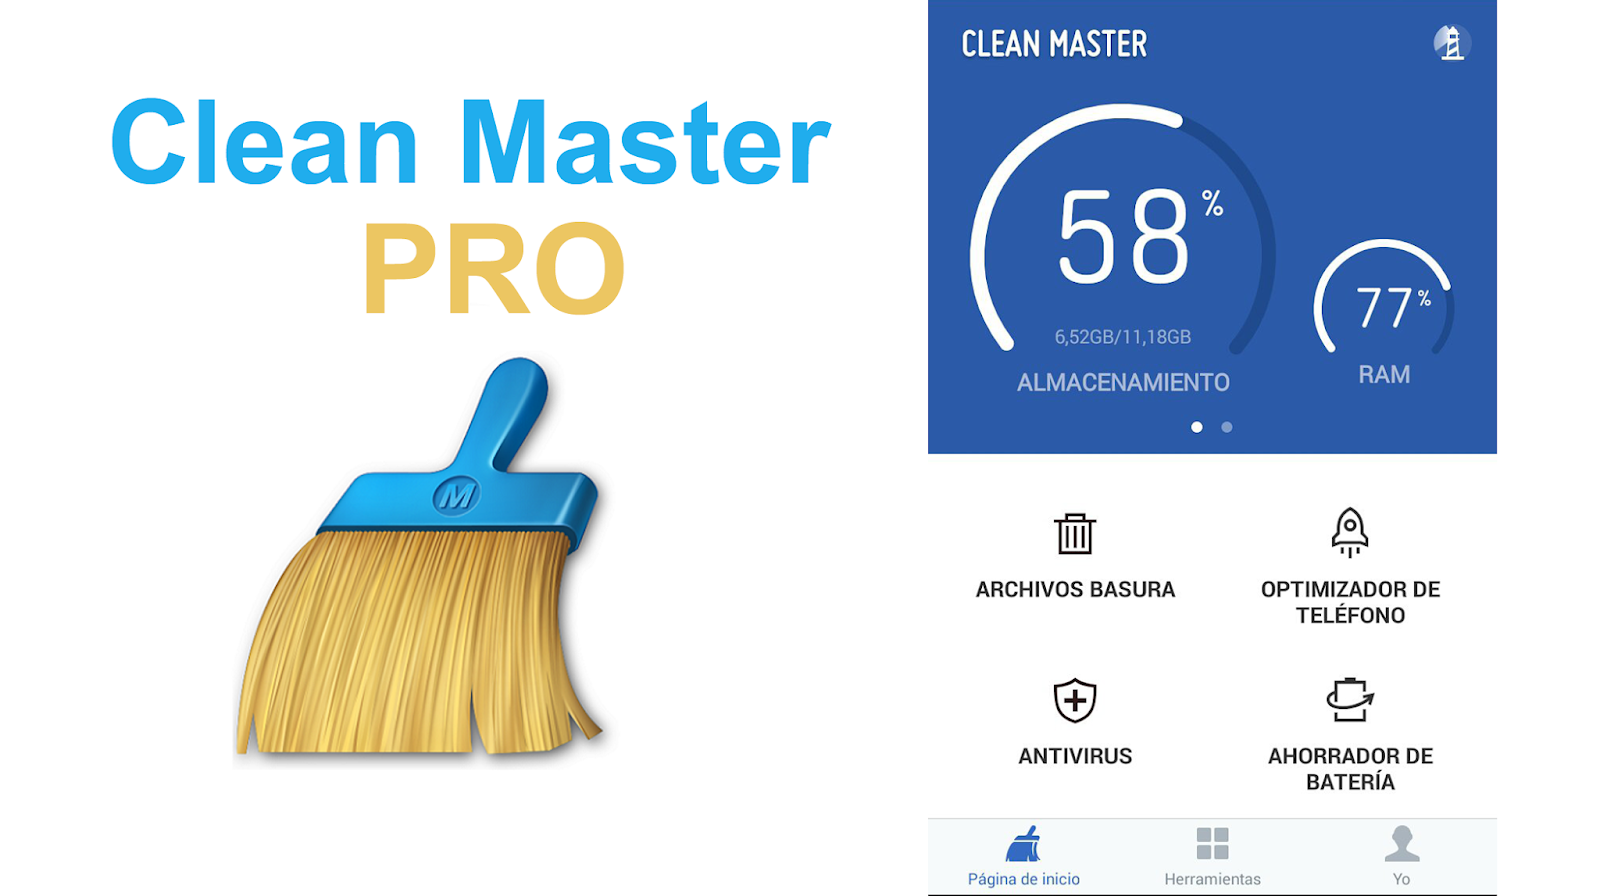 Download Clean Master PRO APK 2019 - Sohail Amir